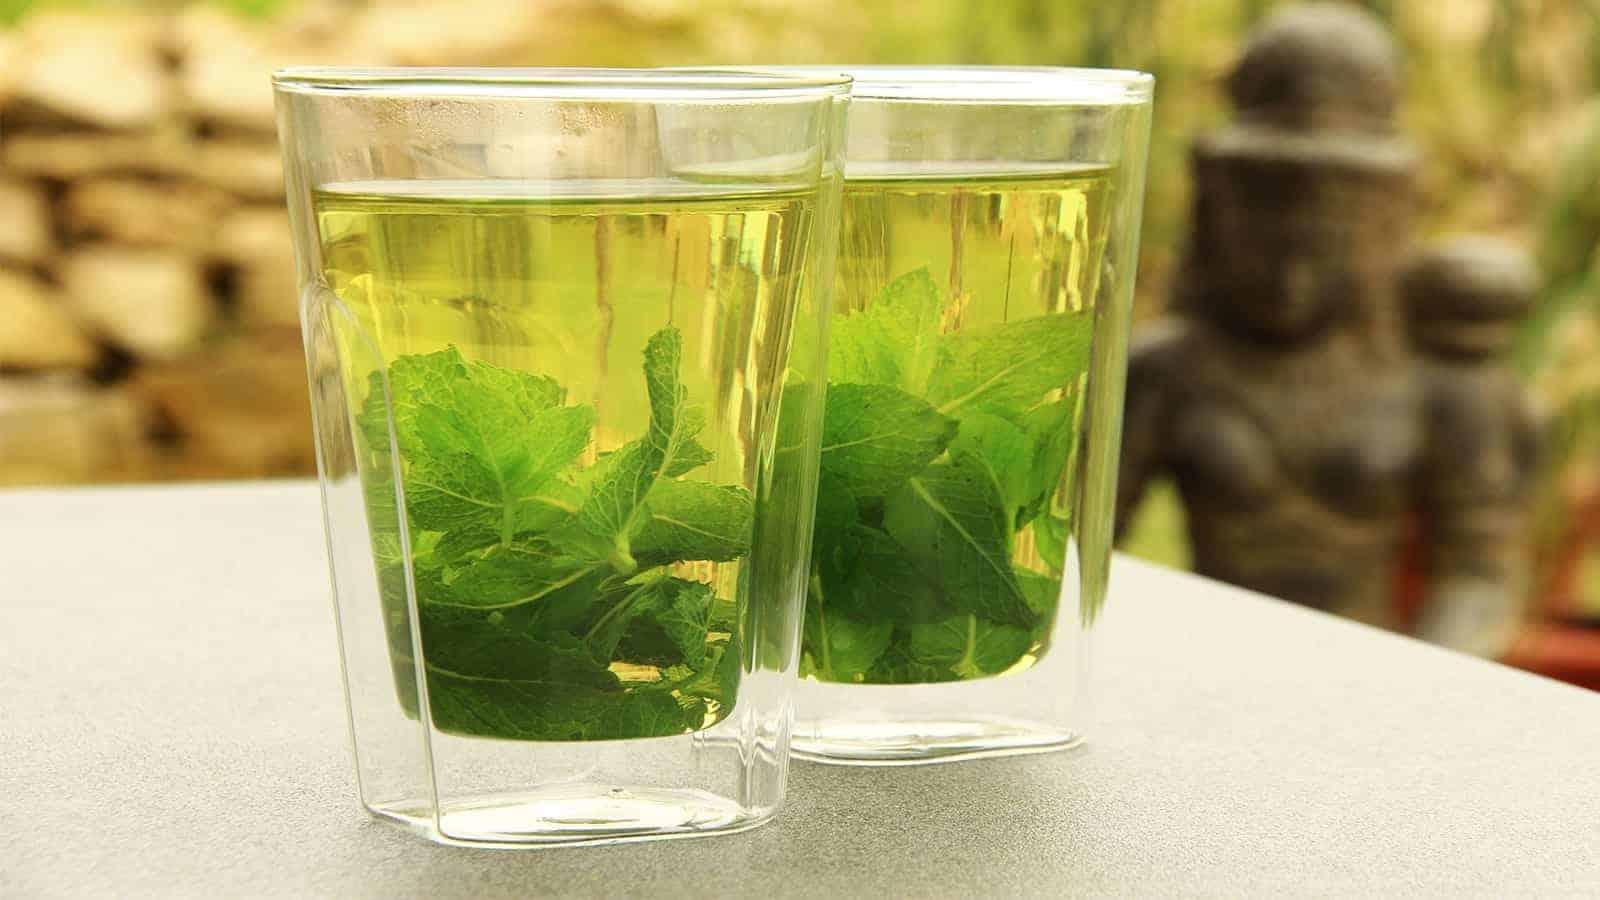 MAGIC Healing Peppermint Tea: Treat Cough, Sore Throat And More